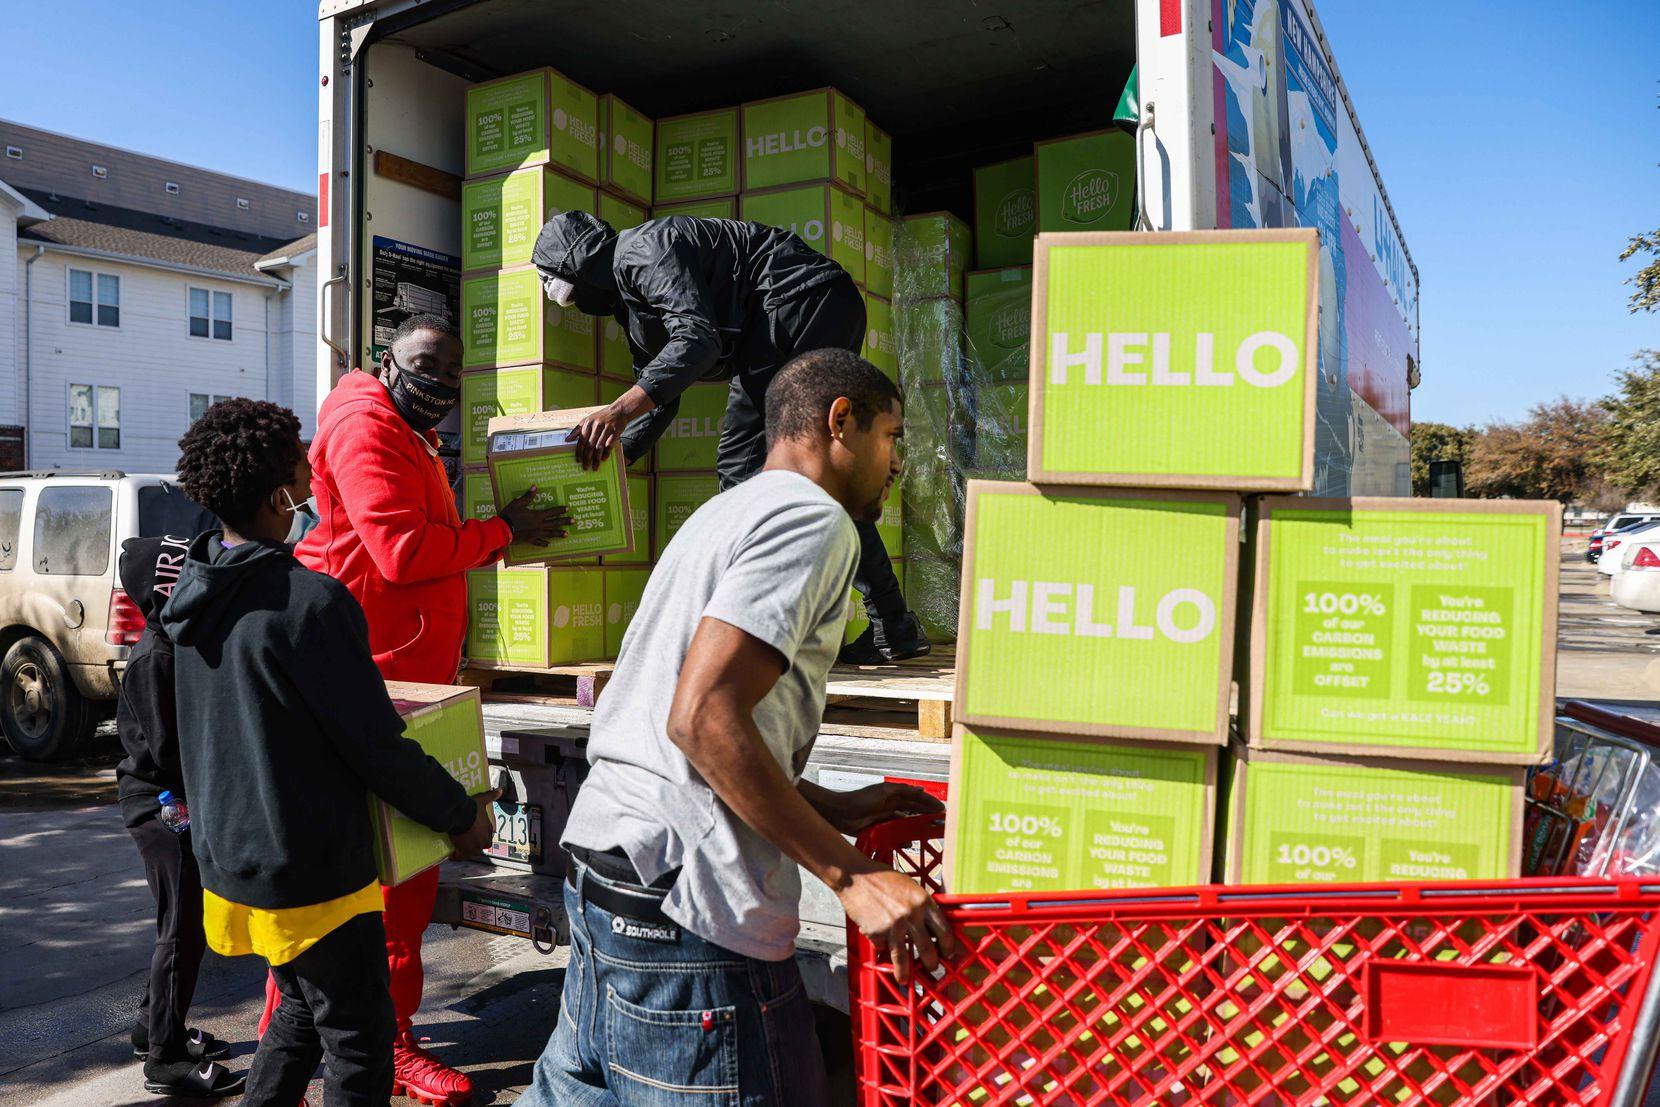 Volunteers haul boxes of food into Lakewest Senior Housing near Singleton Boulevard and Hampton Road in West Dallas on Saturday, Feb. 20, 2021.